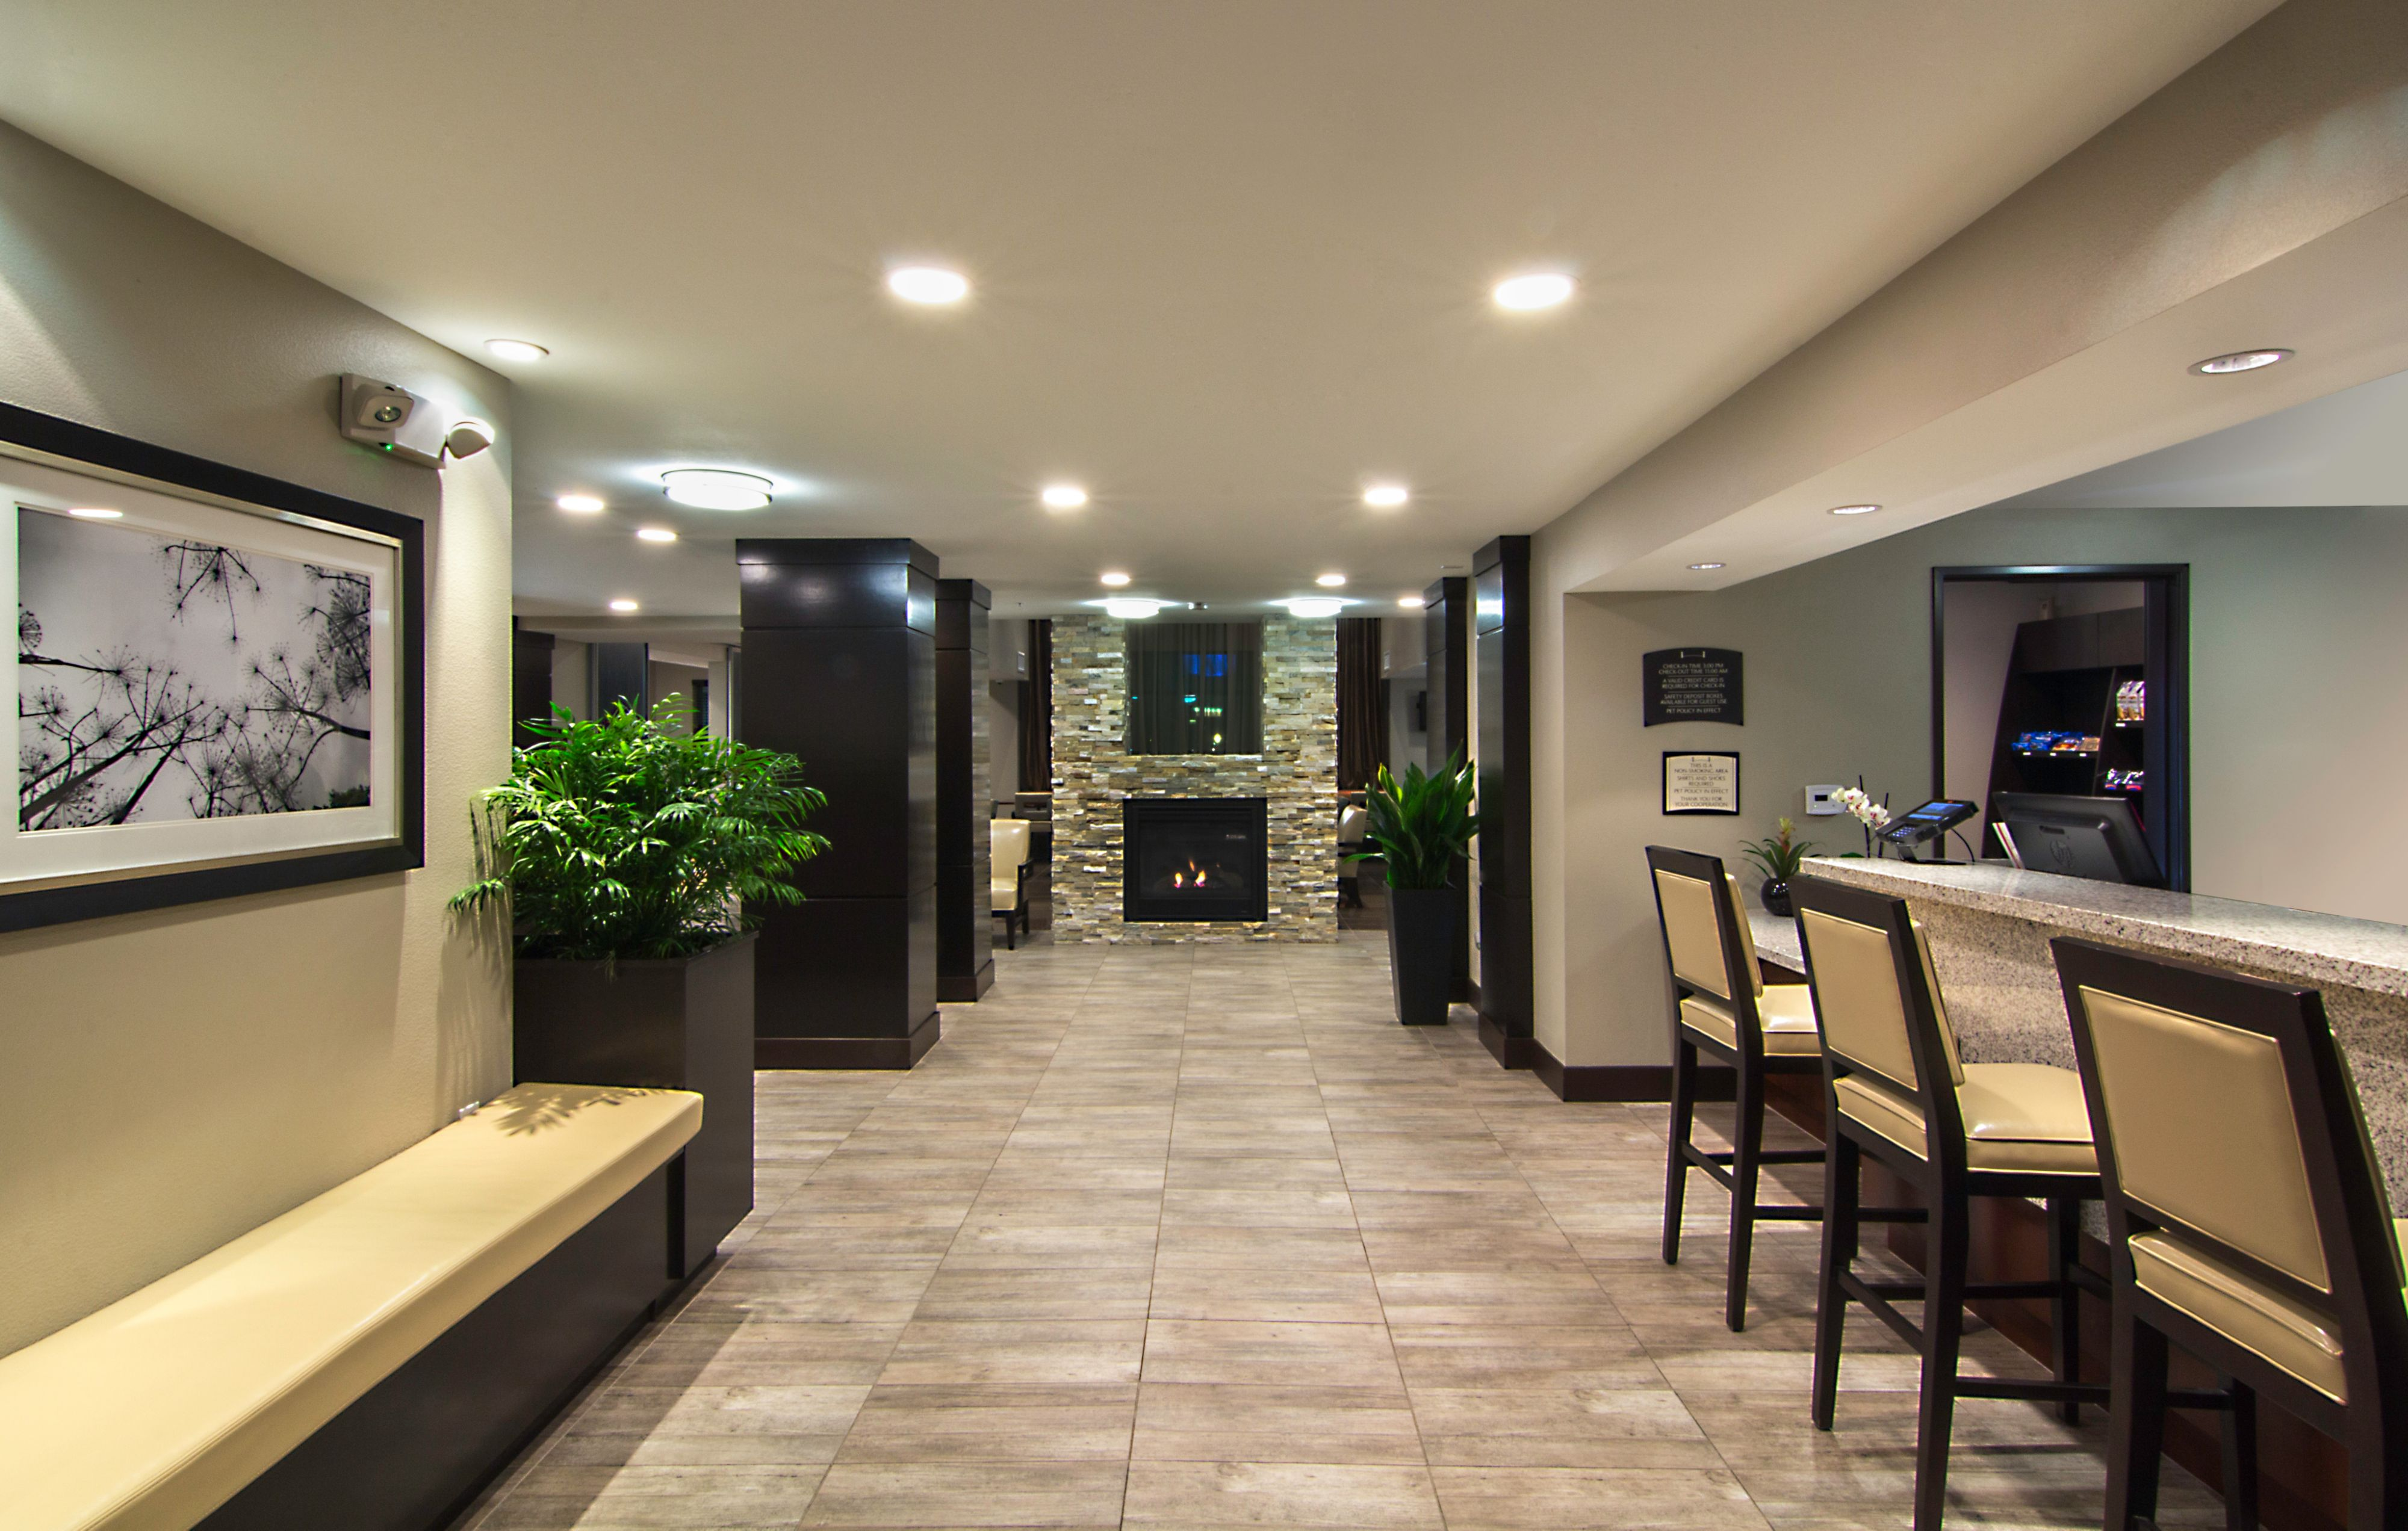 Staybridge Suites Carlsbad - San Diego image 5